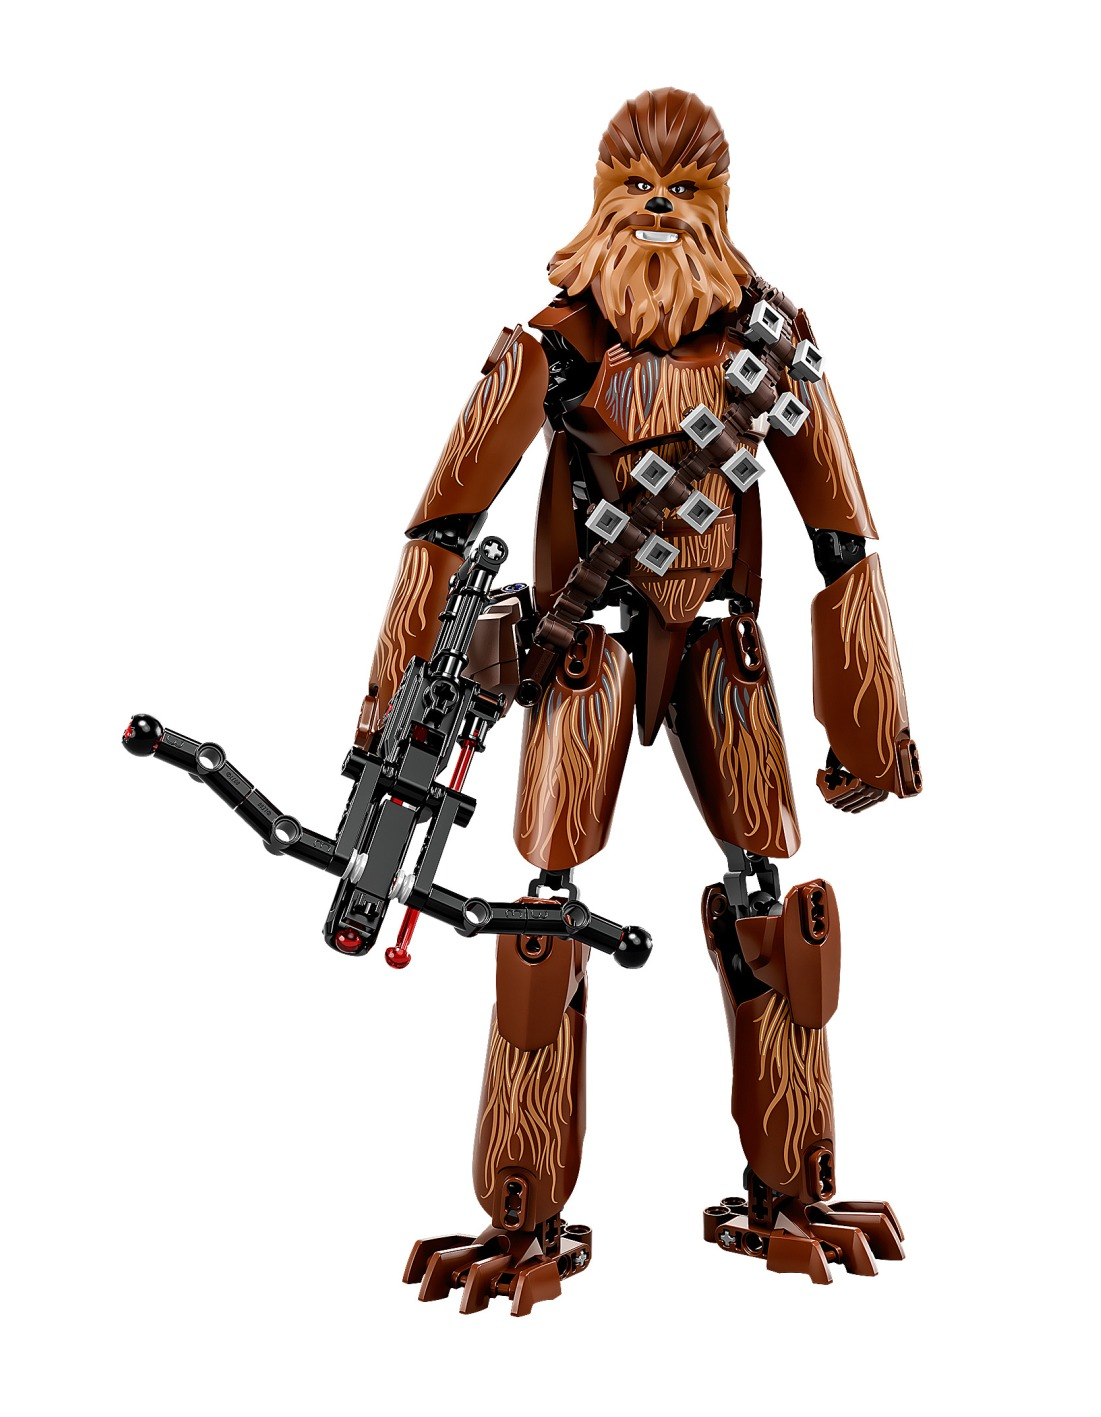 LEGO Star Wars - Chewbacca (75530) image